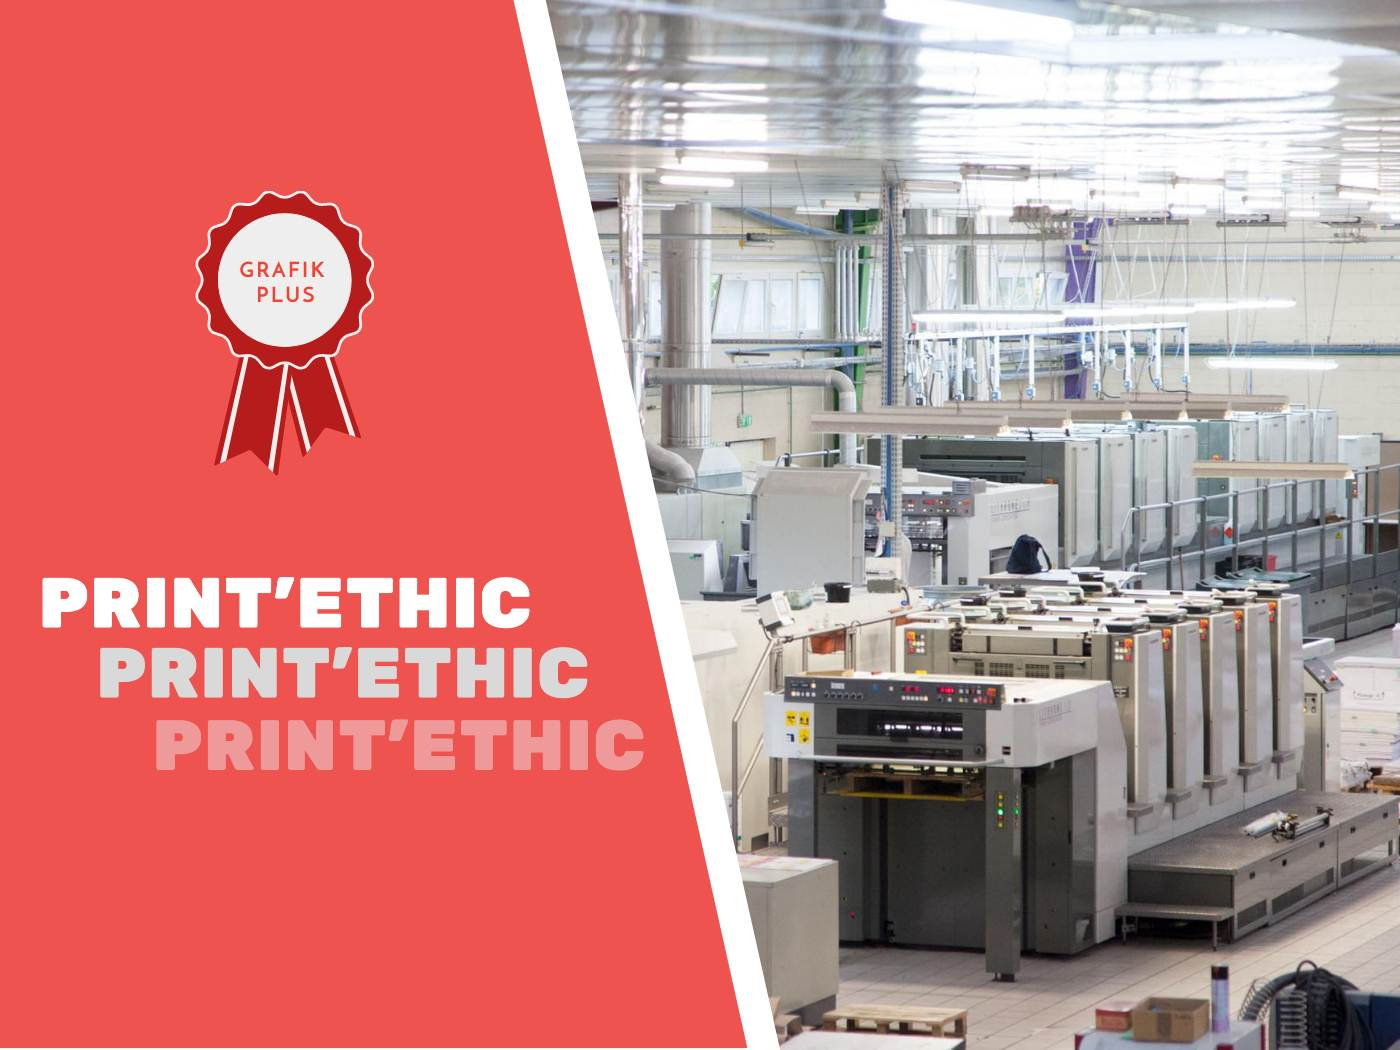 grafik-plus-imprimerie-RSE-print-ethic-paris